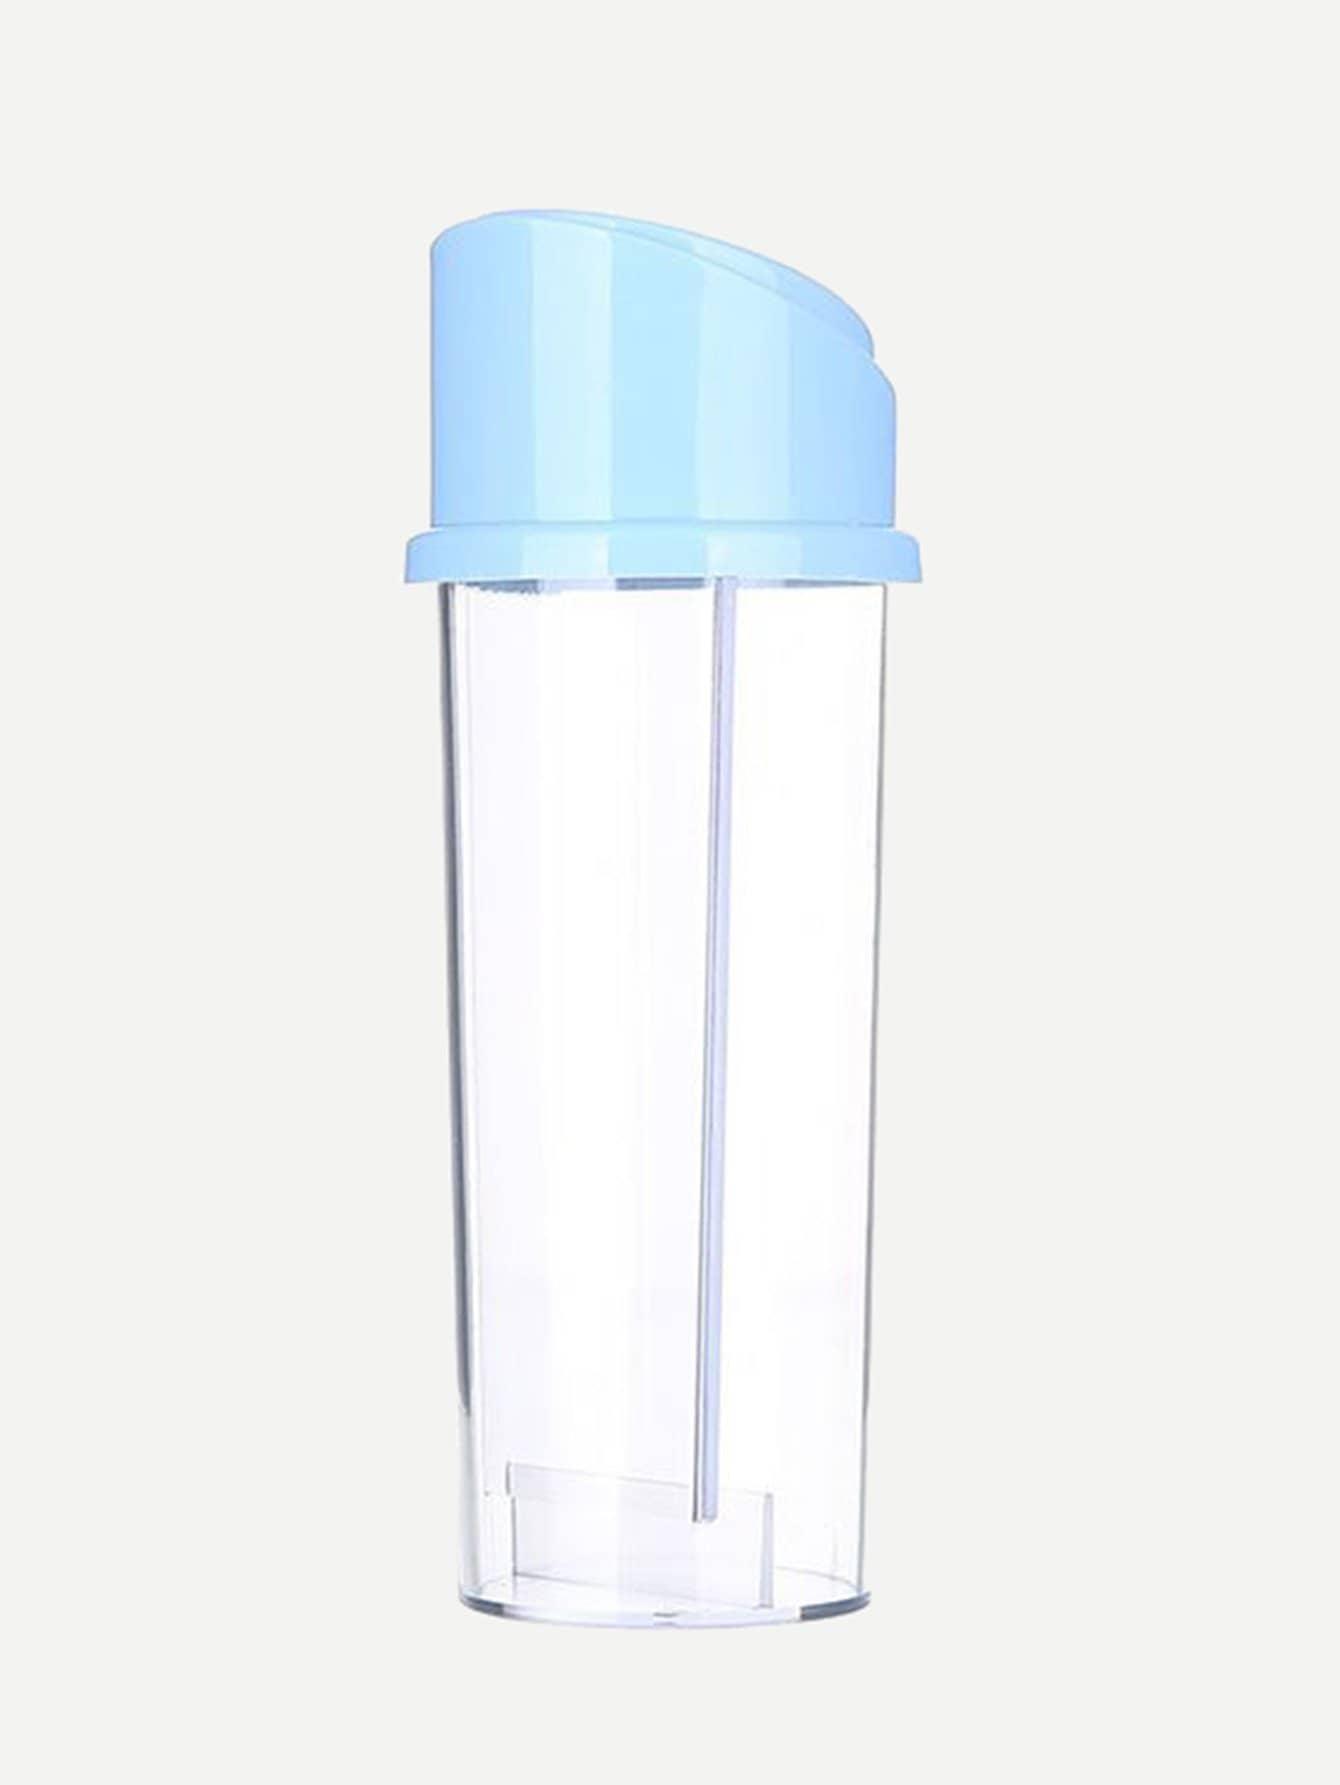 Clear Seasoning Bottle clear seasoning bottle